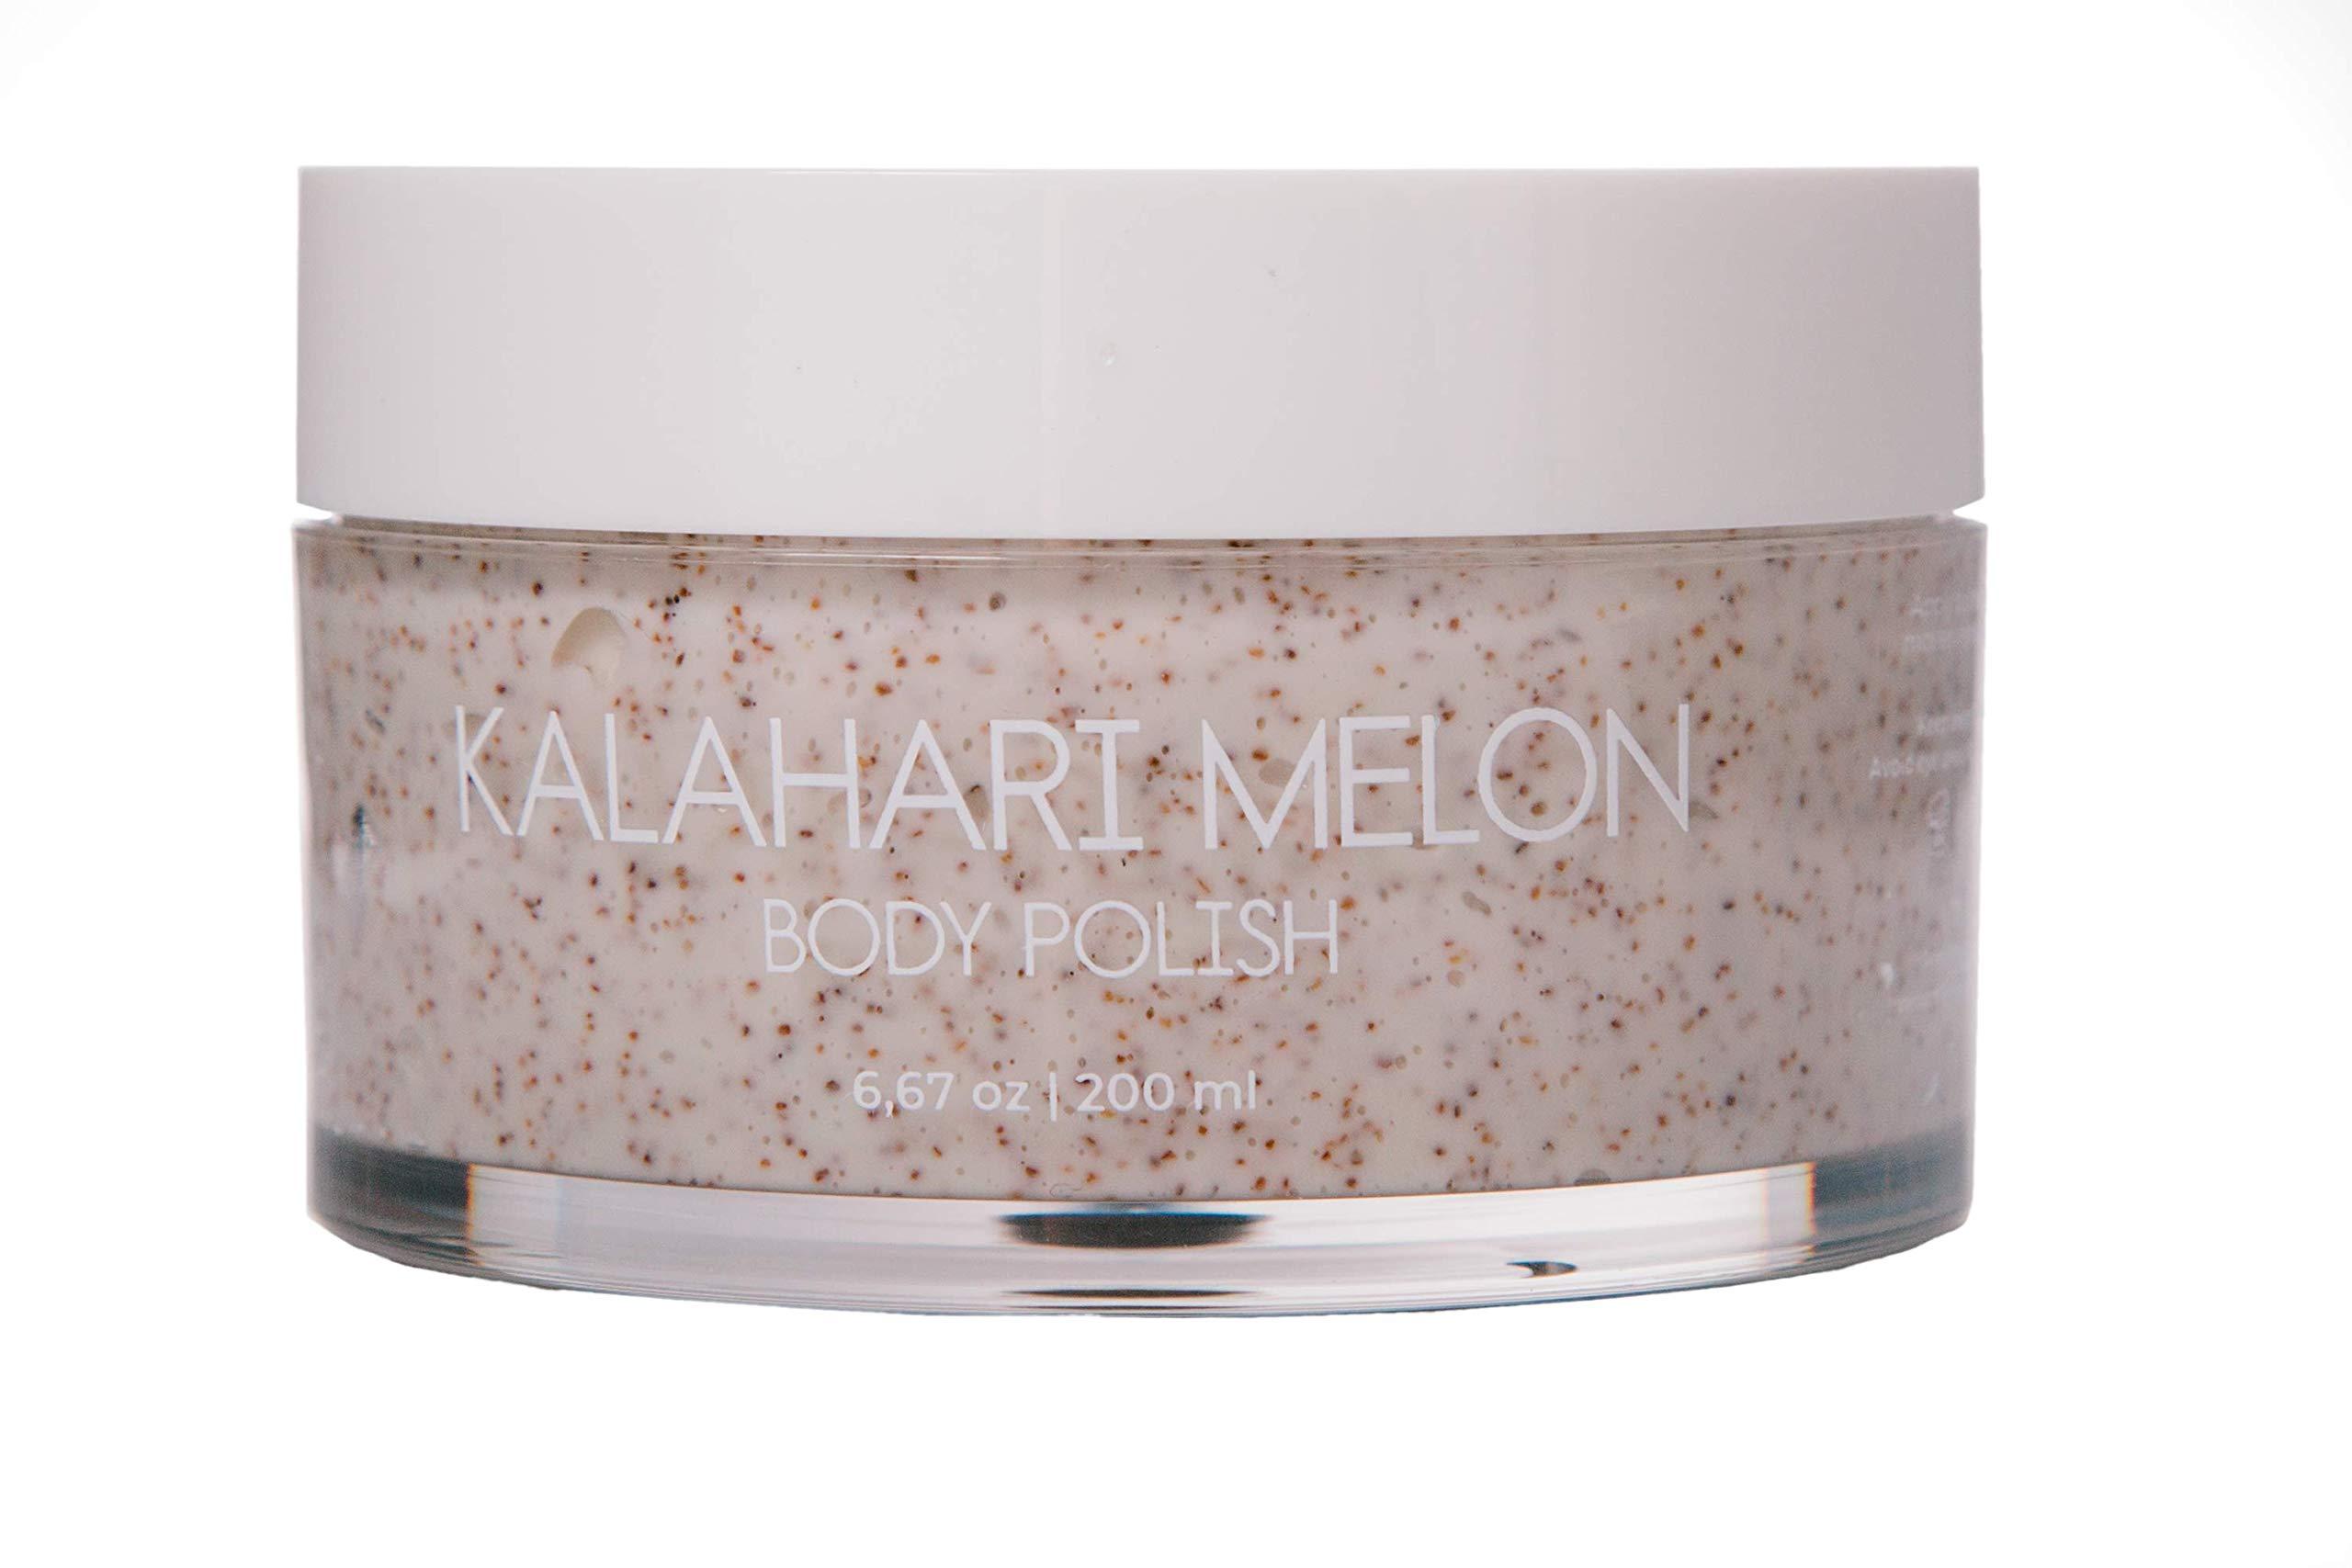 Healing Earth Body Polish Kalahari Melon Rich in Antioxidants and Hydrating 6.67 Ounces